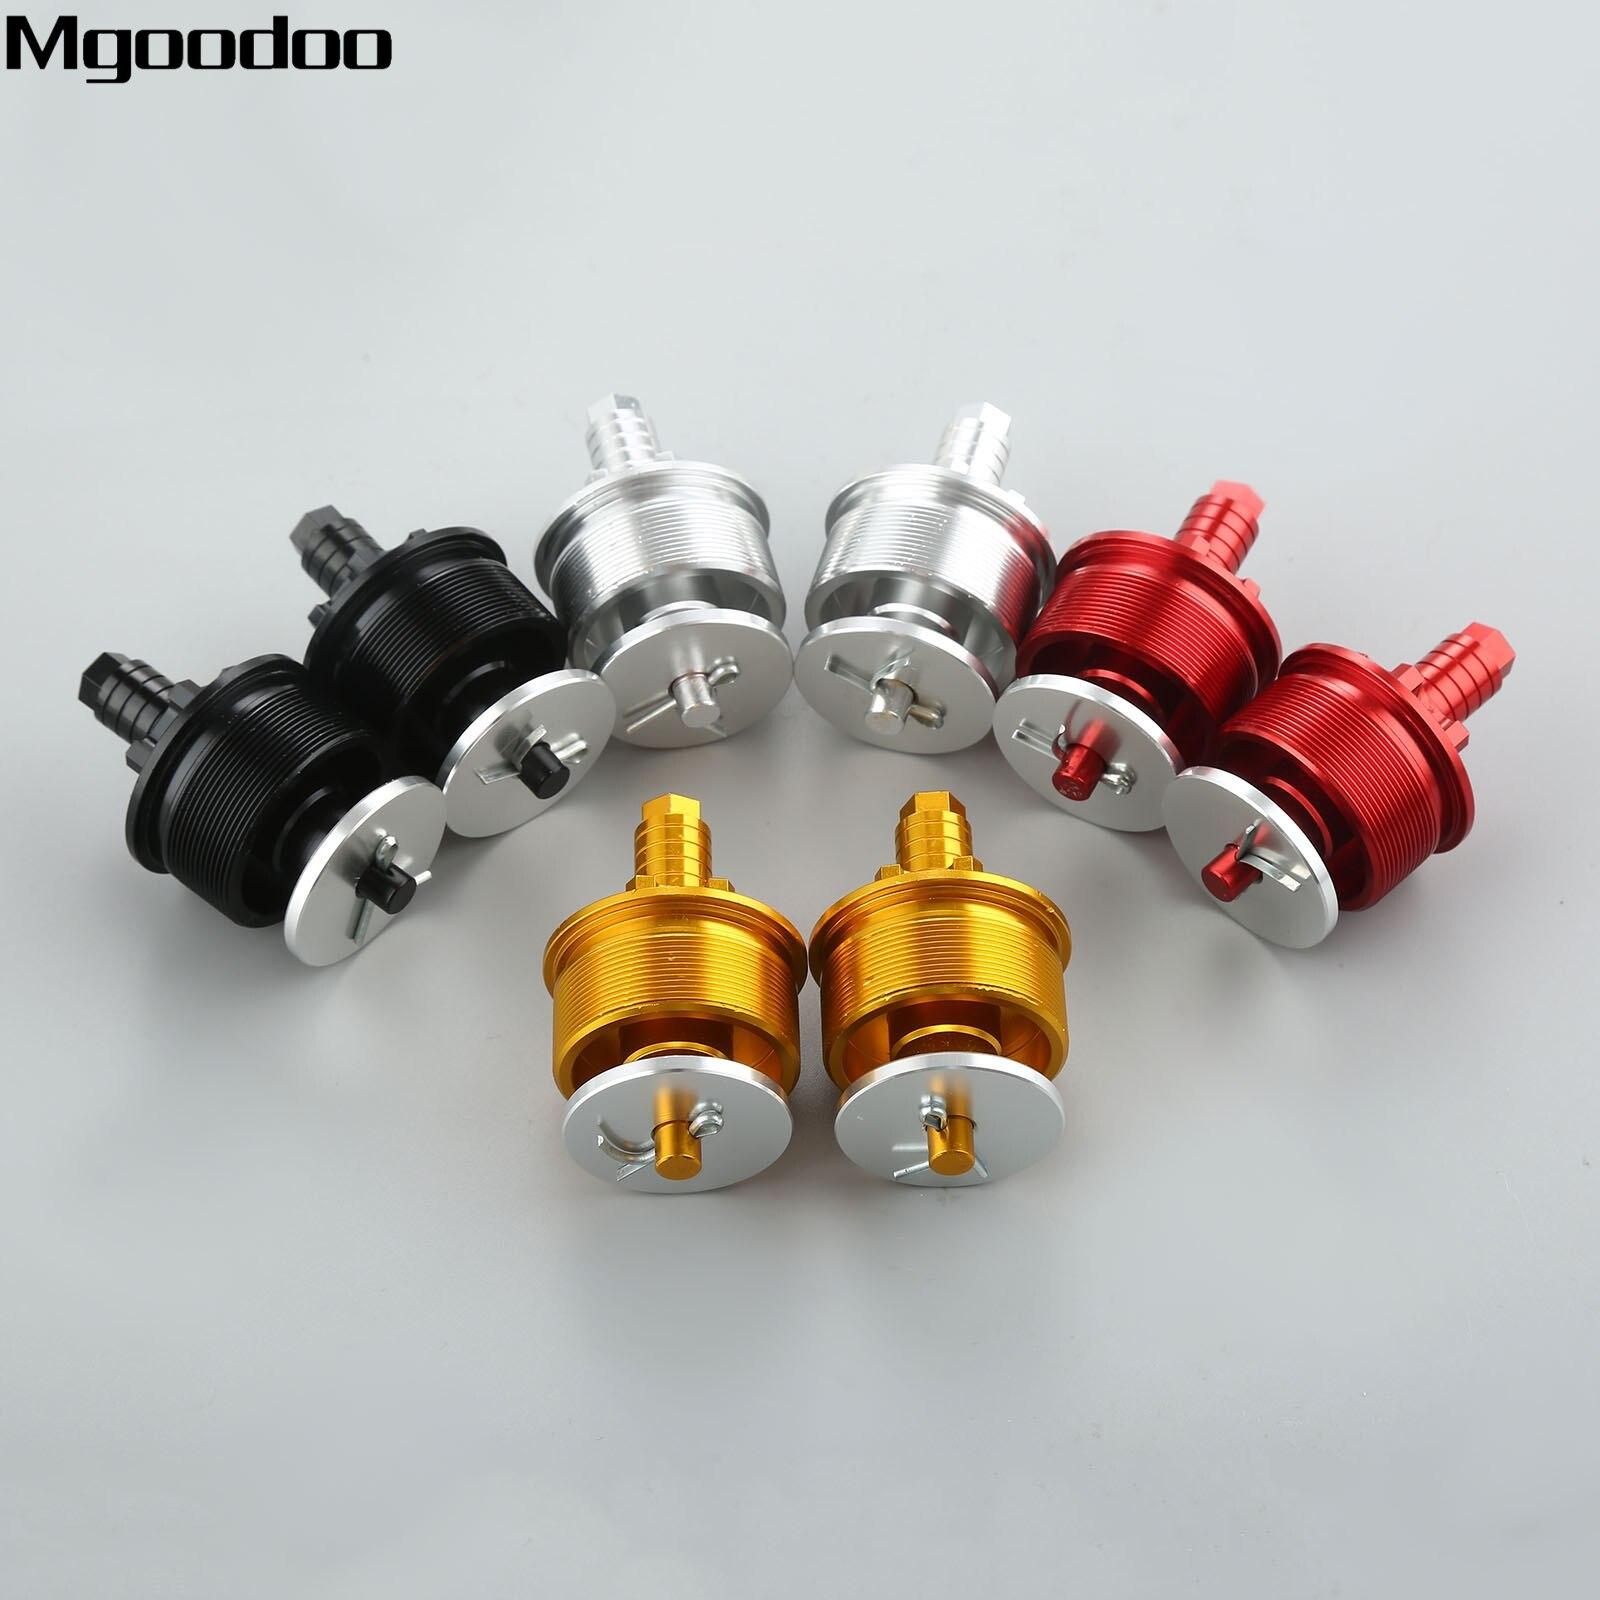 Mgoodoo 2Pcs 41MM Motorcycle CNC Preload Adjuster <font><b>Fork</b></font> Bolts Cap For Honda CB400/SR400 Motocross Enduro Dirt Bike High Quality